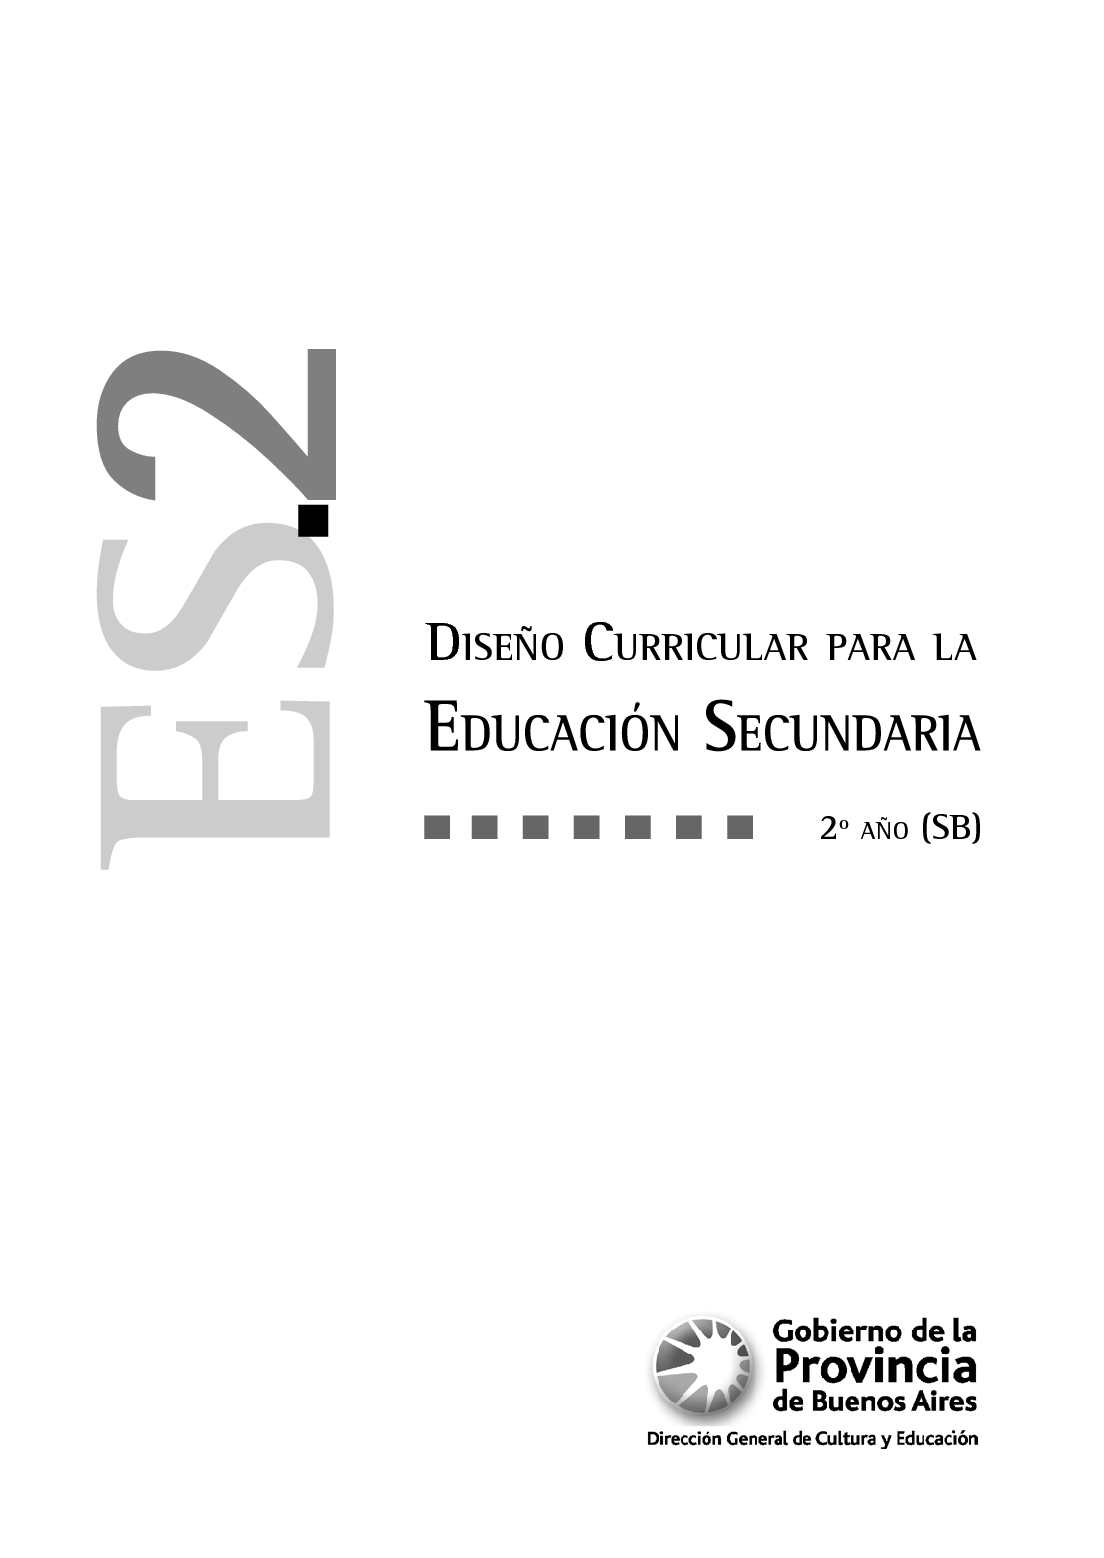 Calaméo - Diseño Curricular Secundaria 2º año